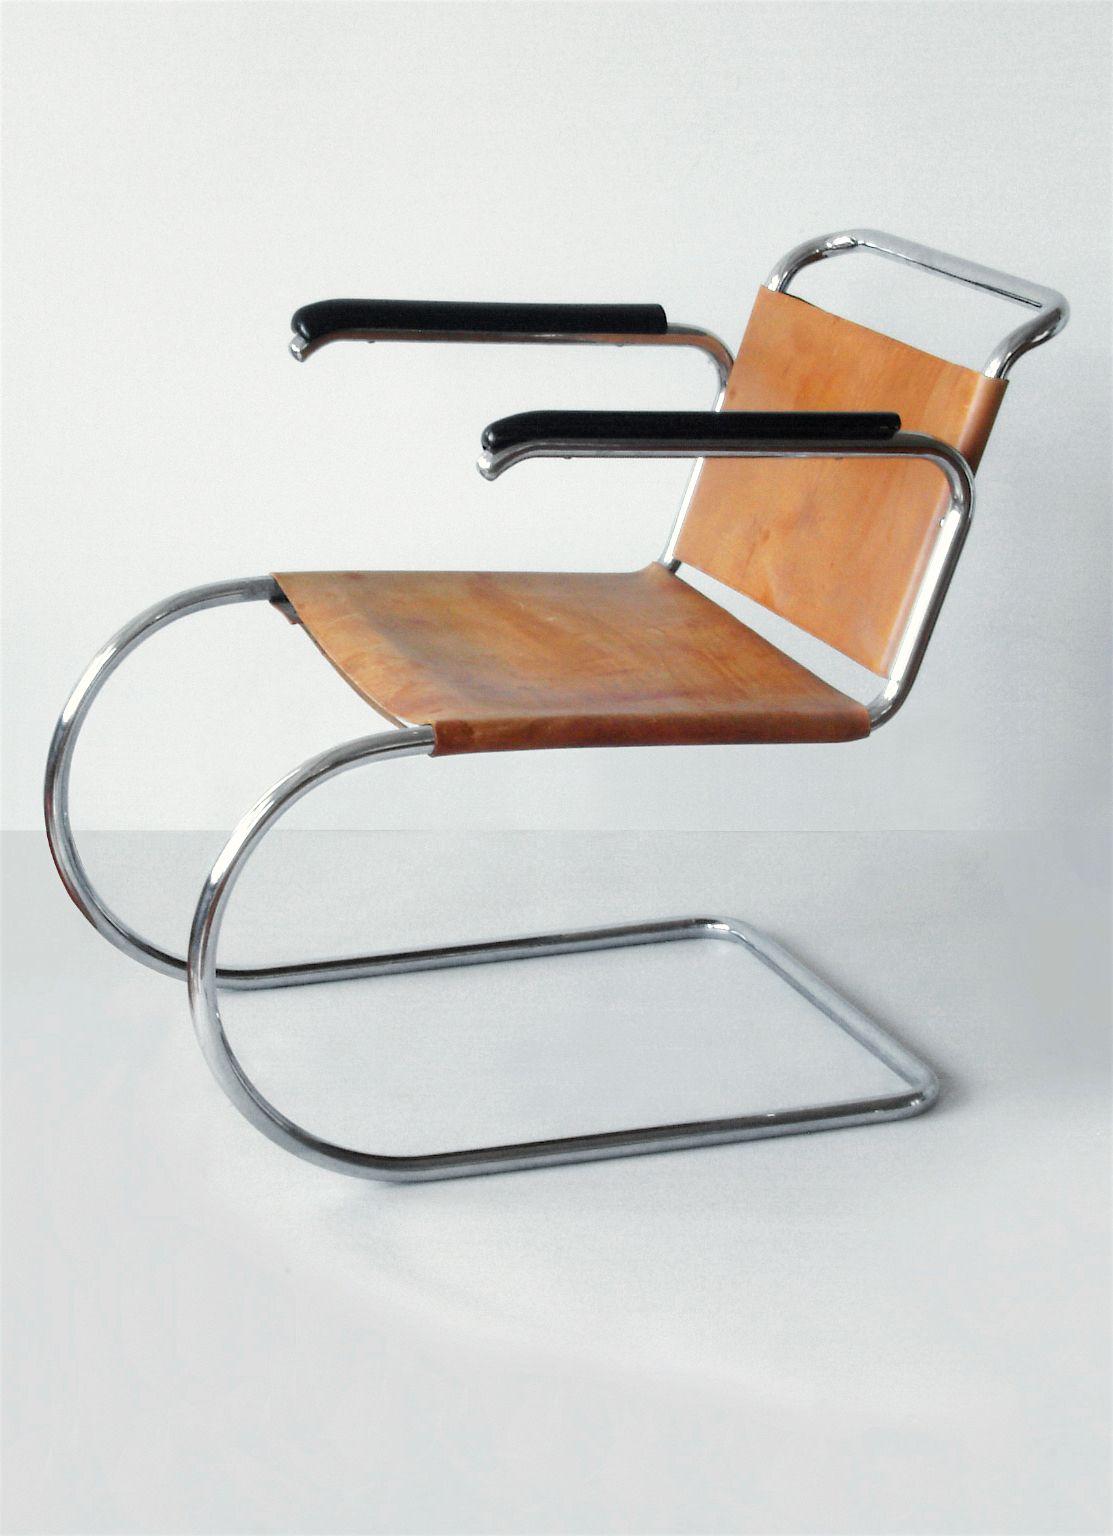 Mies Van Der Rohe Cantilever Mr Armchair Prototype Berlin Circa